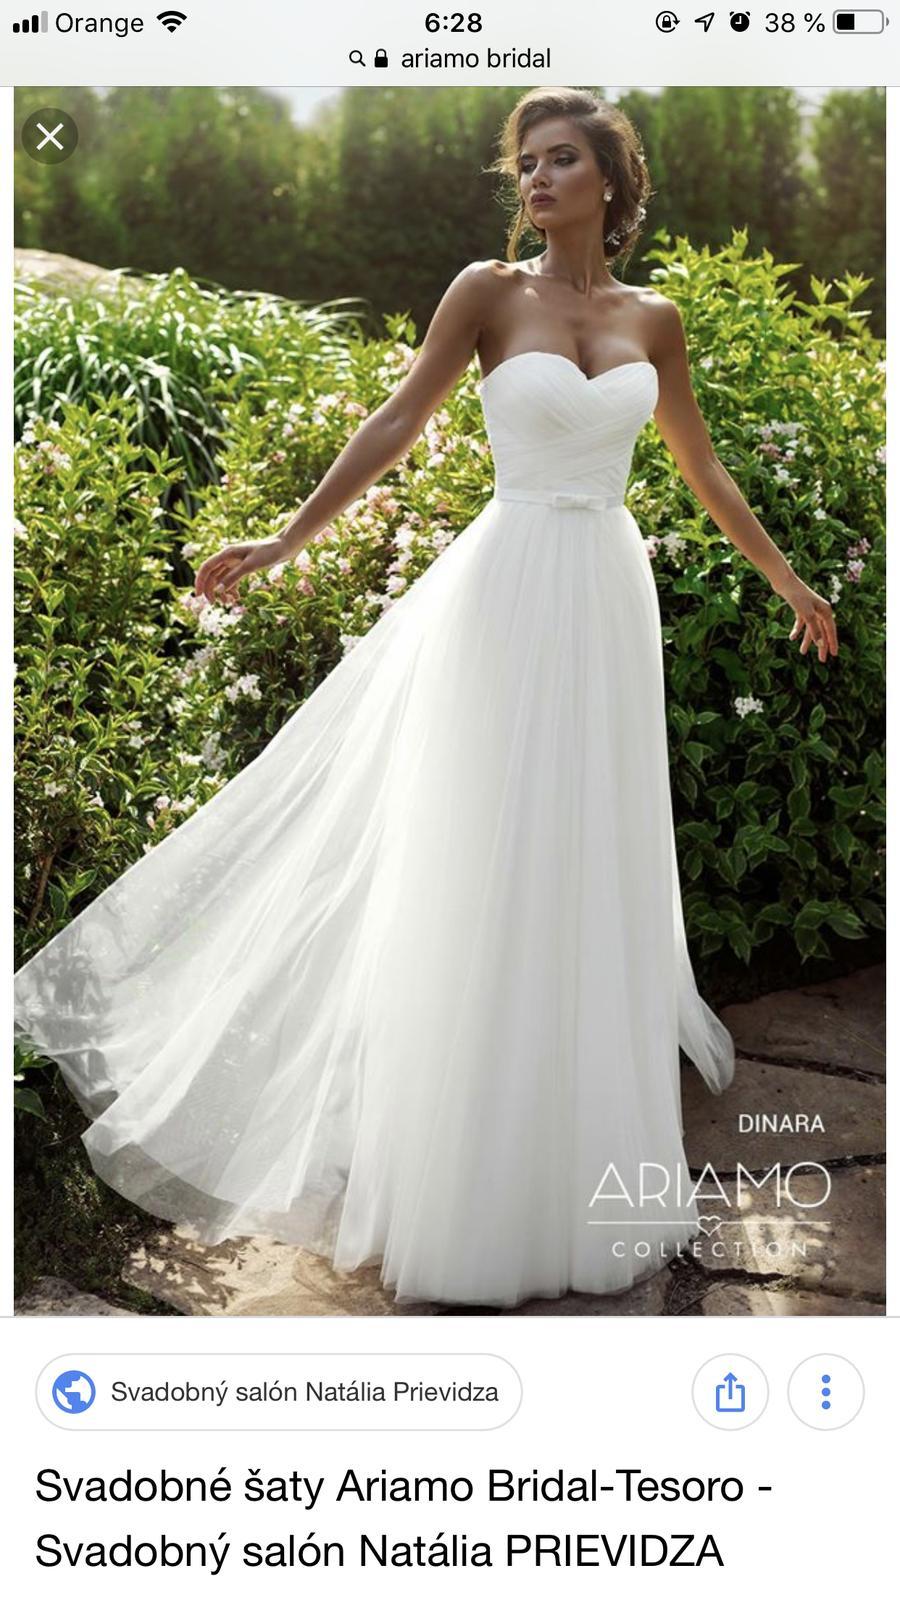 6657ddff3dbb Svadobné šaty ariamo bridal dinara